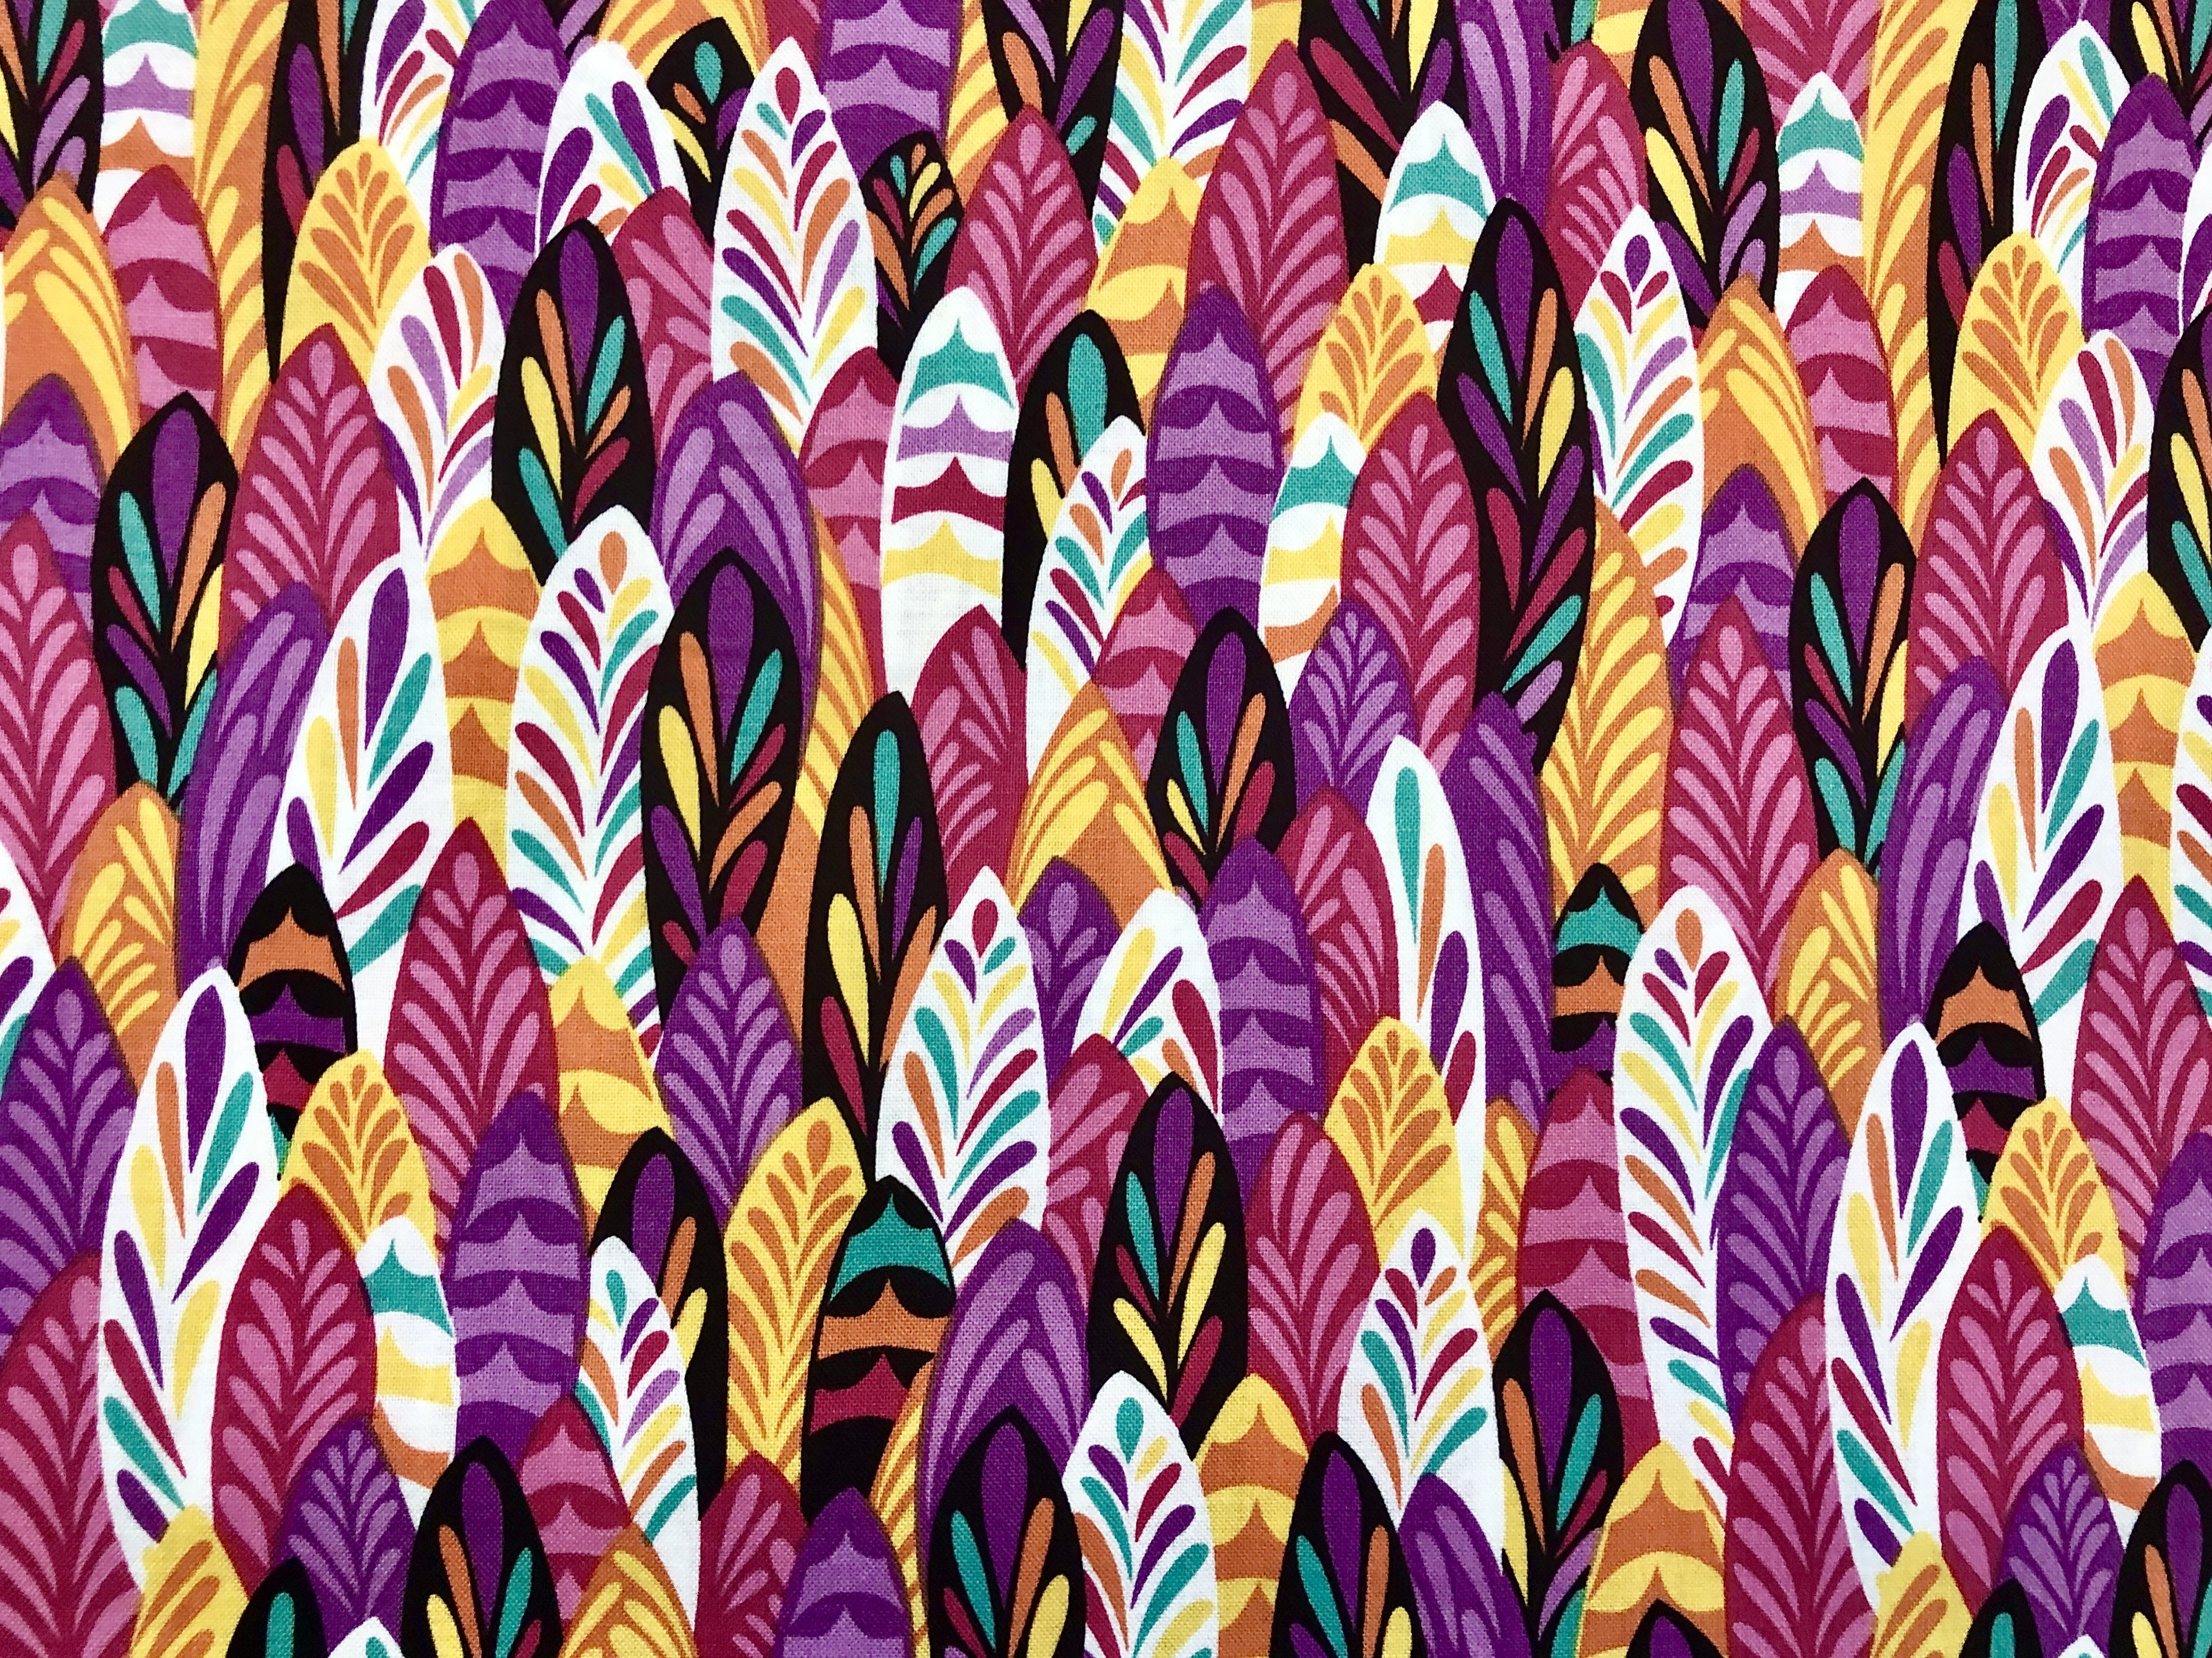 Feathers & Foliage - Wilmington Fabrics - 1/2m cut 55450